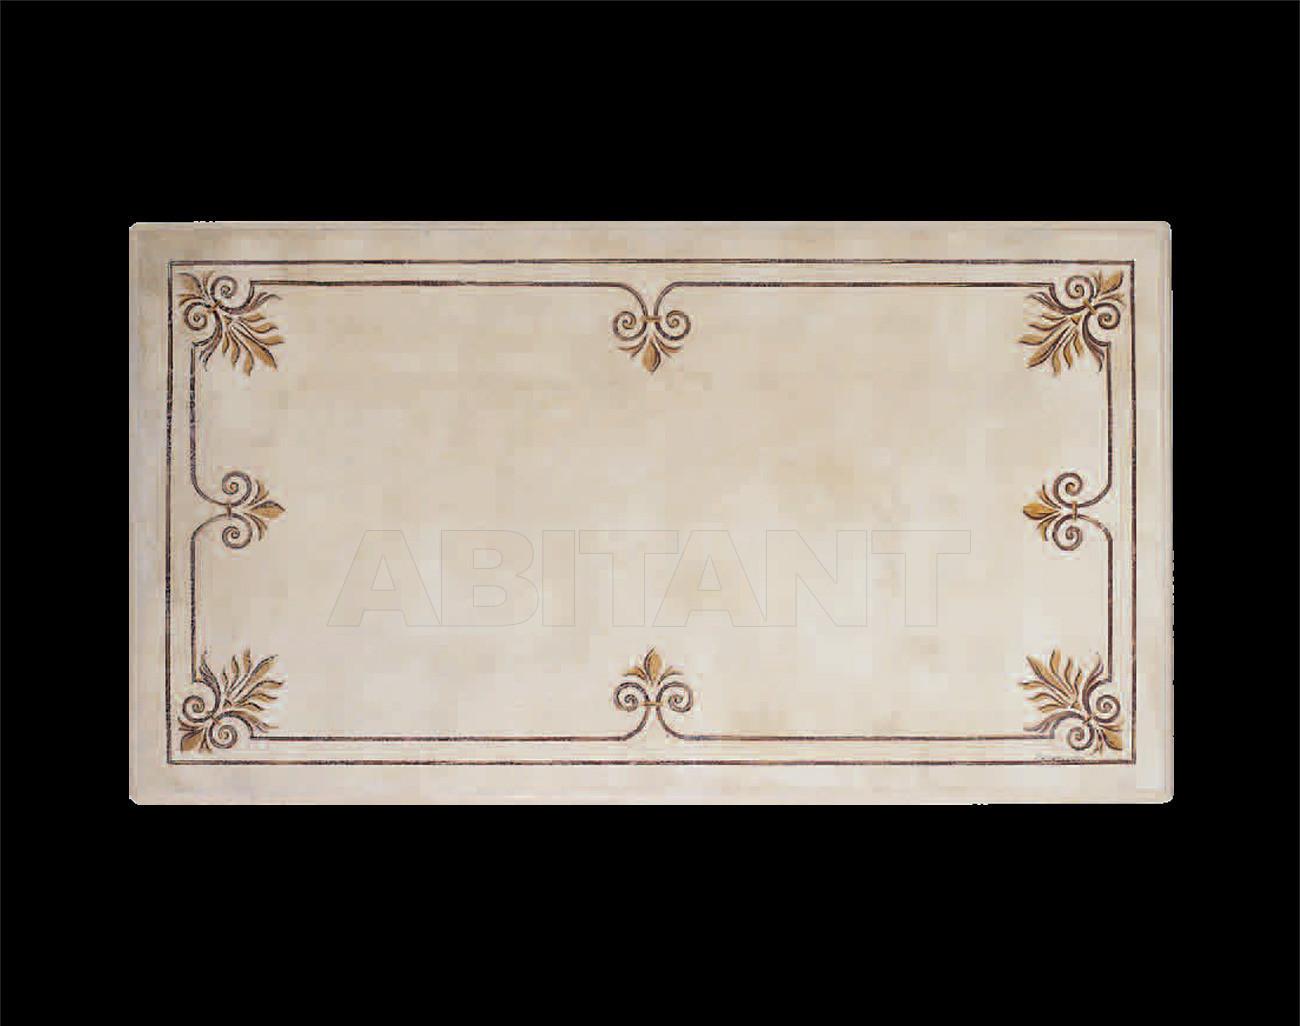 Купить Топ Domiziani Materia mat 30 180 x 100